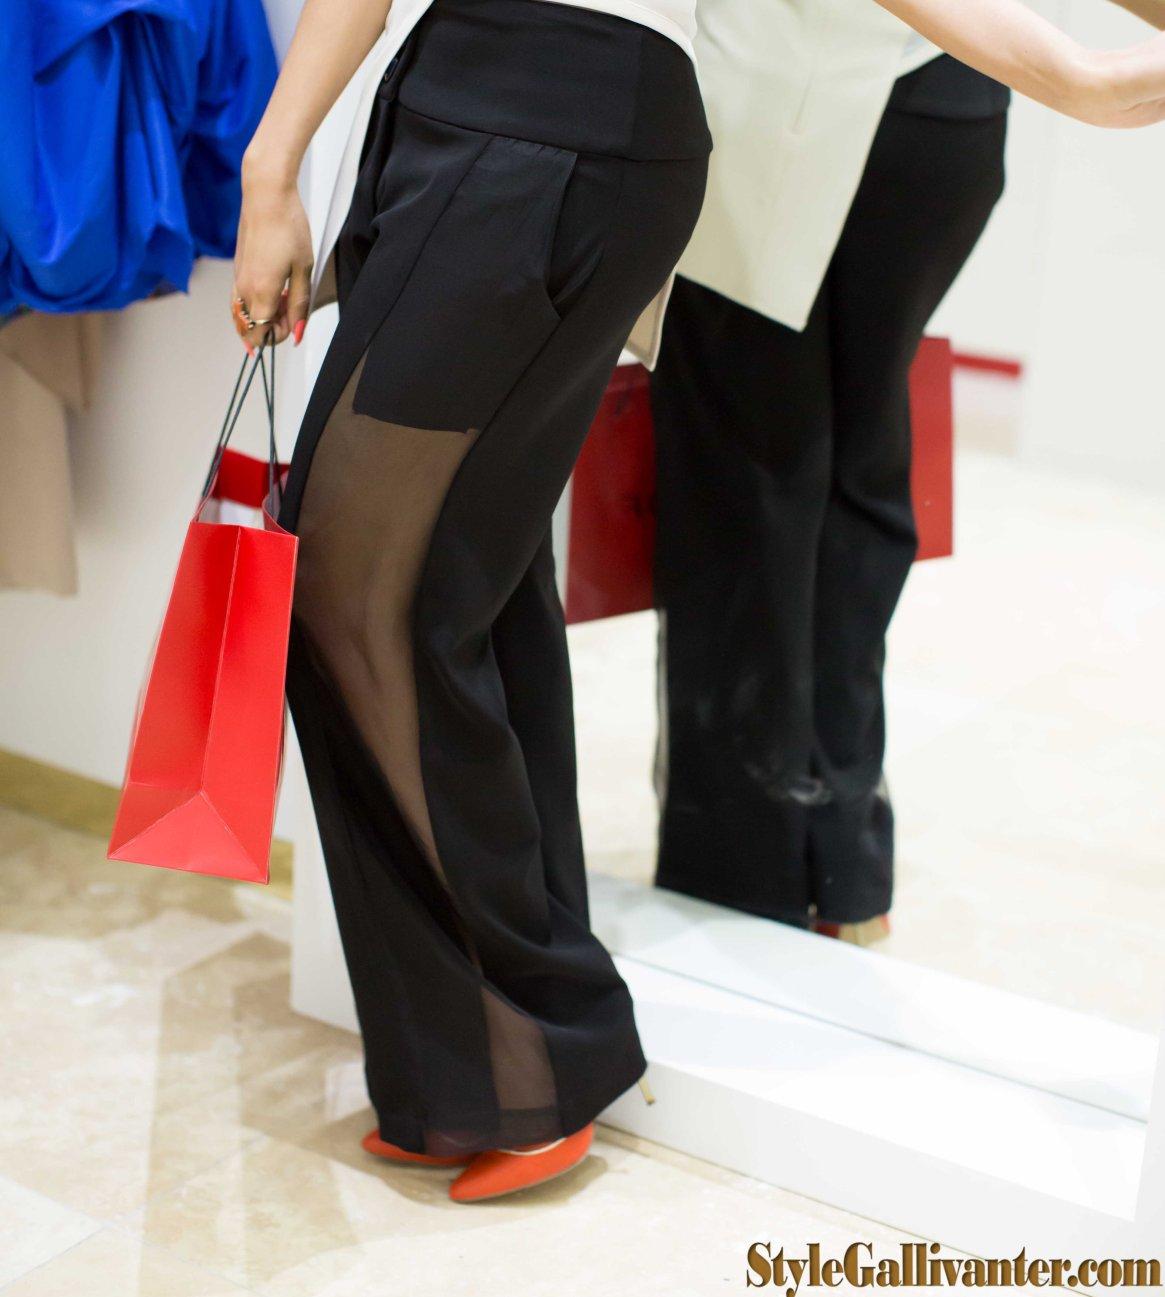 sexy-classy-pants_sheer-pants-trend_dizingof-store-opening_vip-events-melbourne_best-bloggers-melbourne_best-lingerie-australia_eccentric-trends-melbourne_sexy-classy-pants-melbourne_exclusive-events-melbourne-14